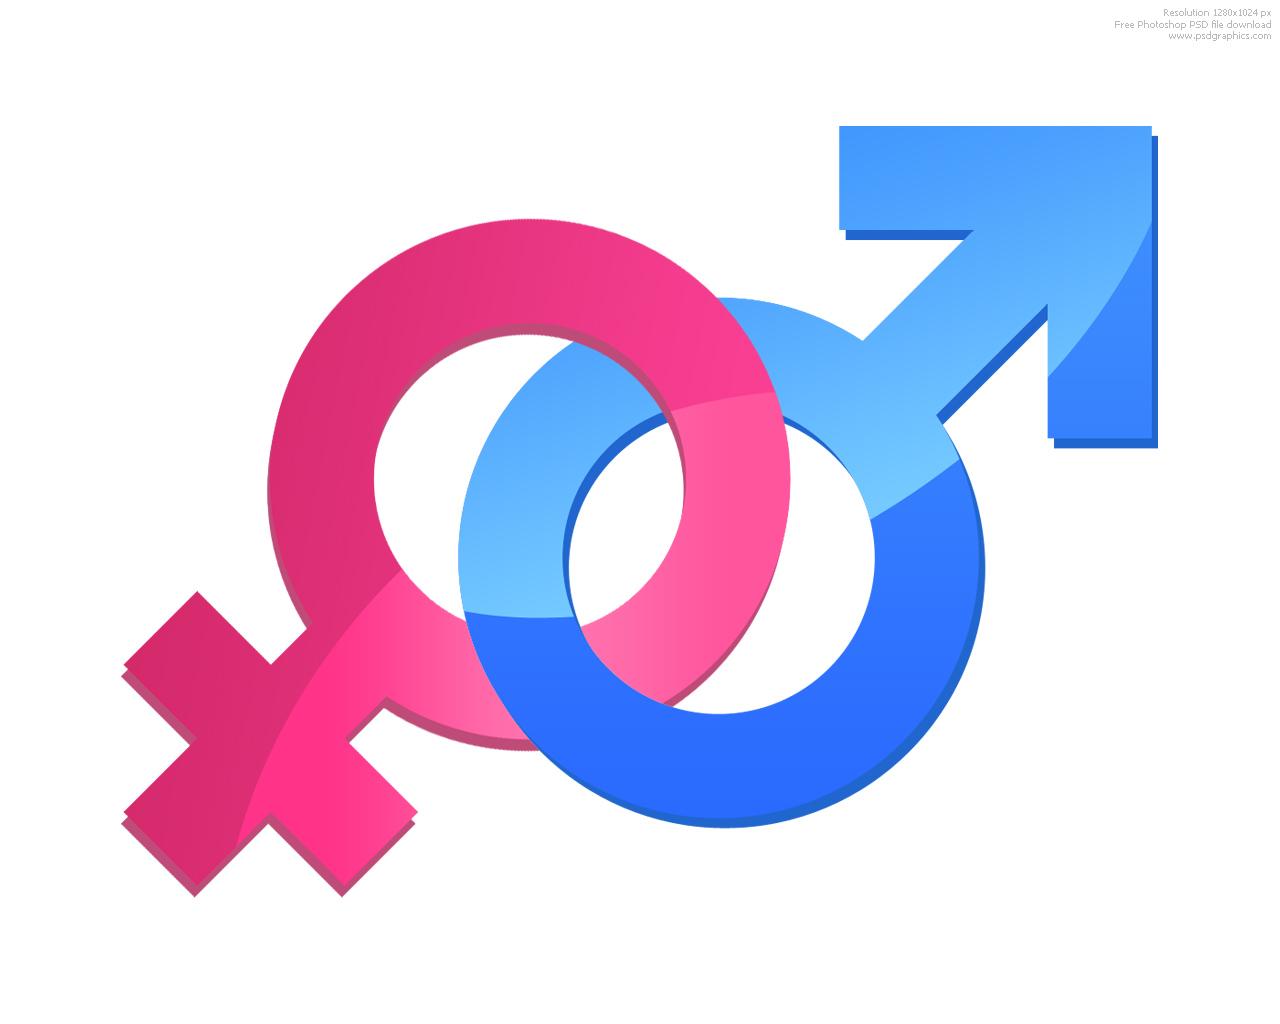 Female  Define Female at Dictionarycom